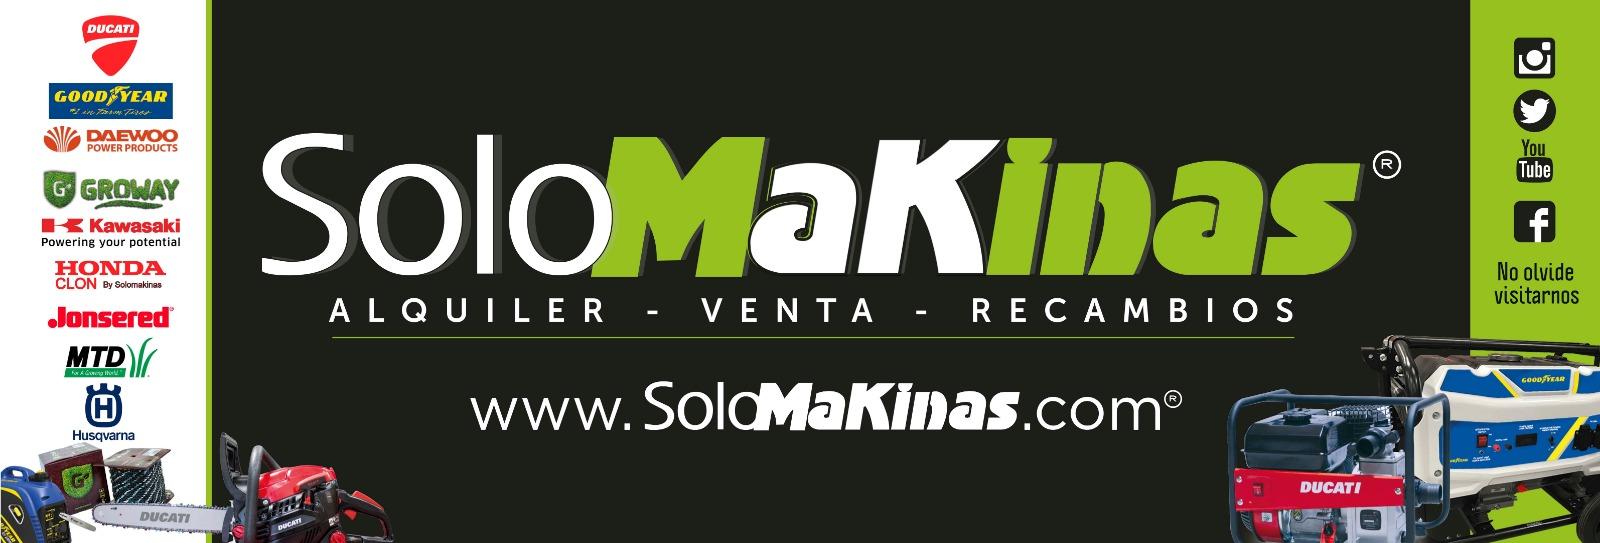 WWW-SOLOMAKINAS-COM BANNER.jpeg